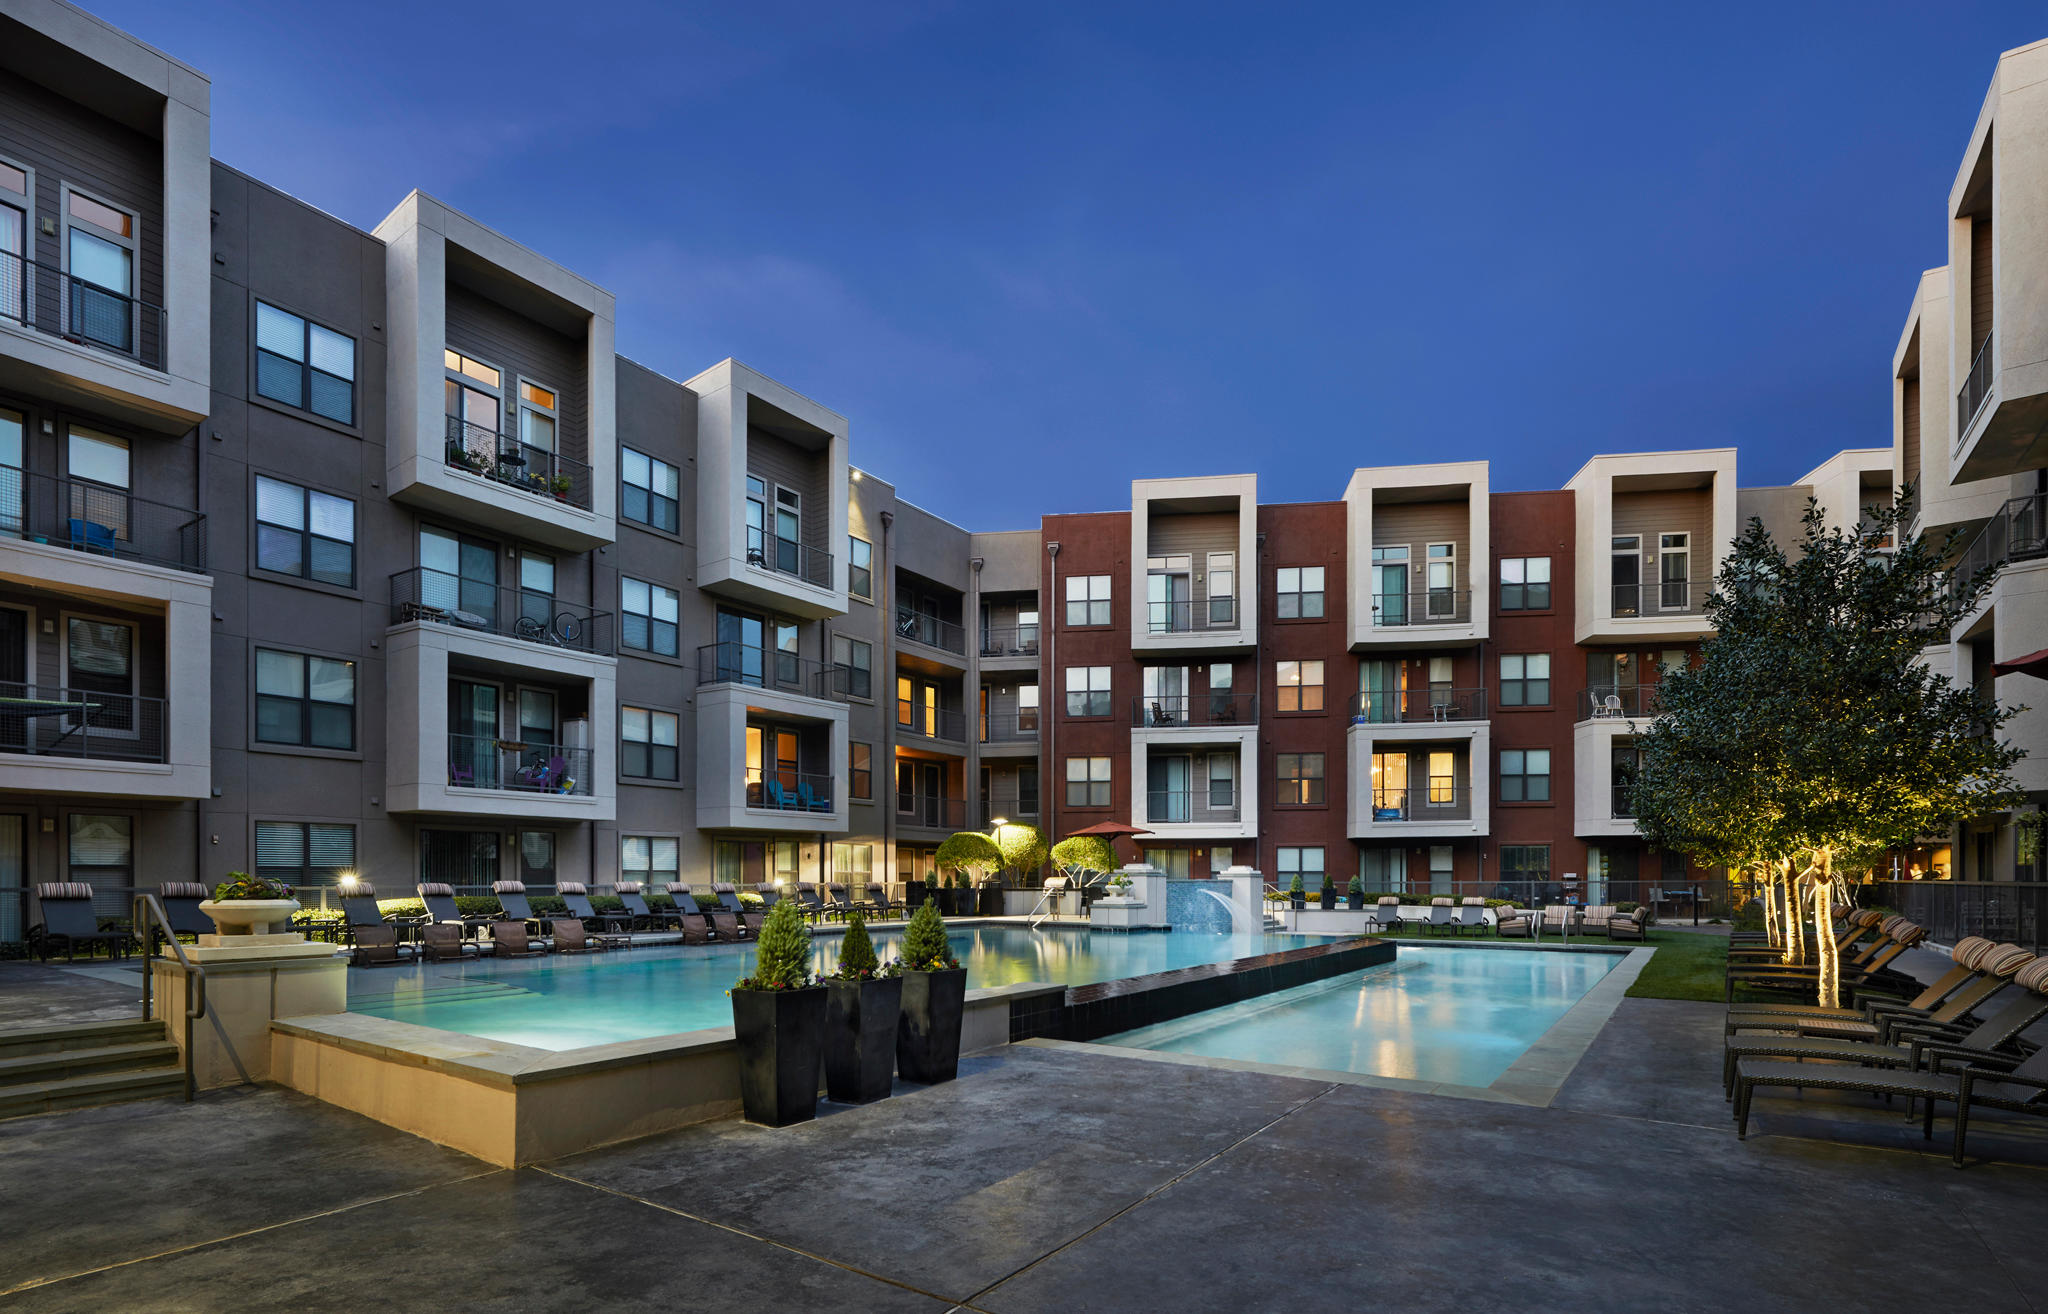 Camden Design District Apartments image 13